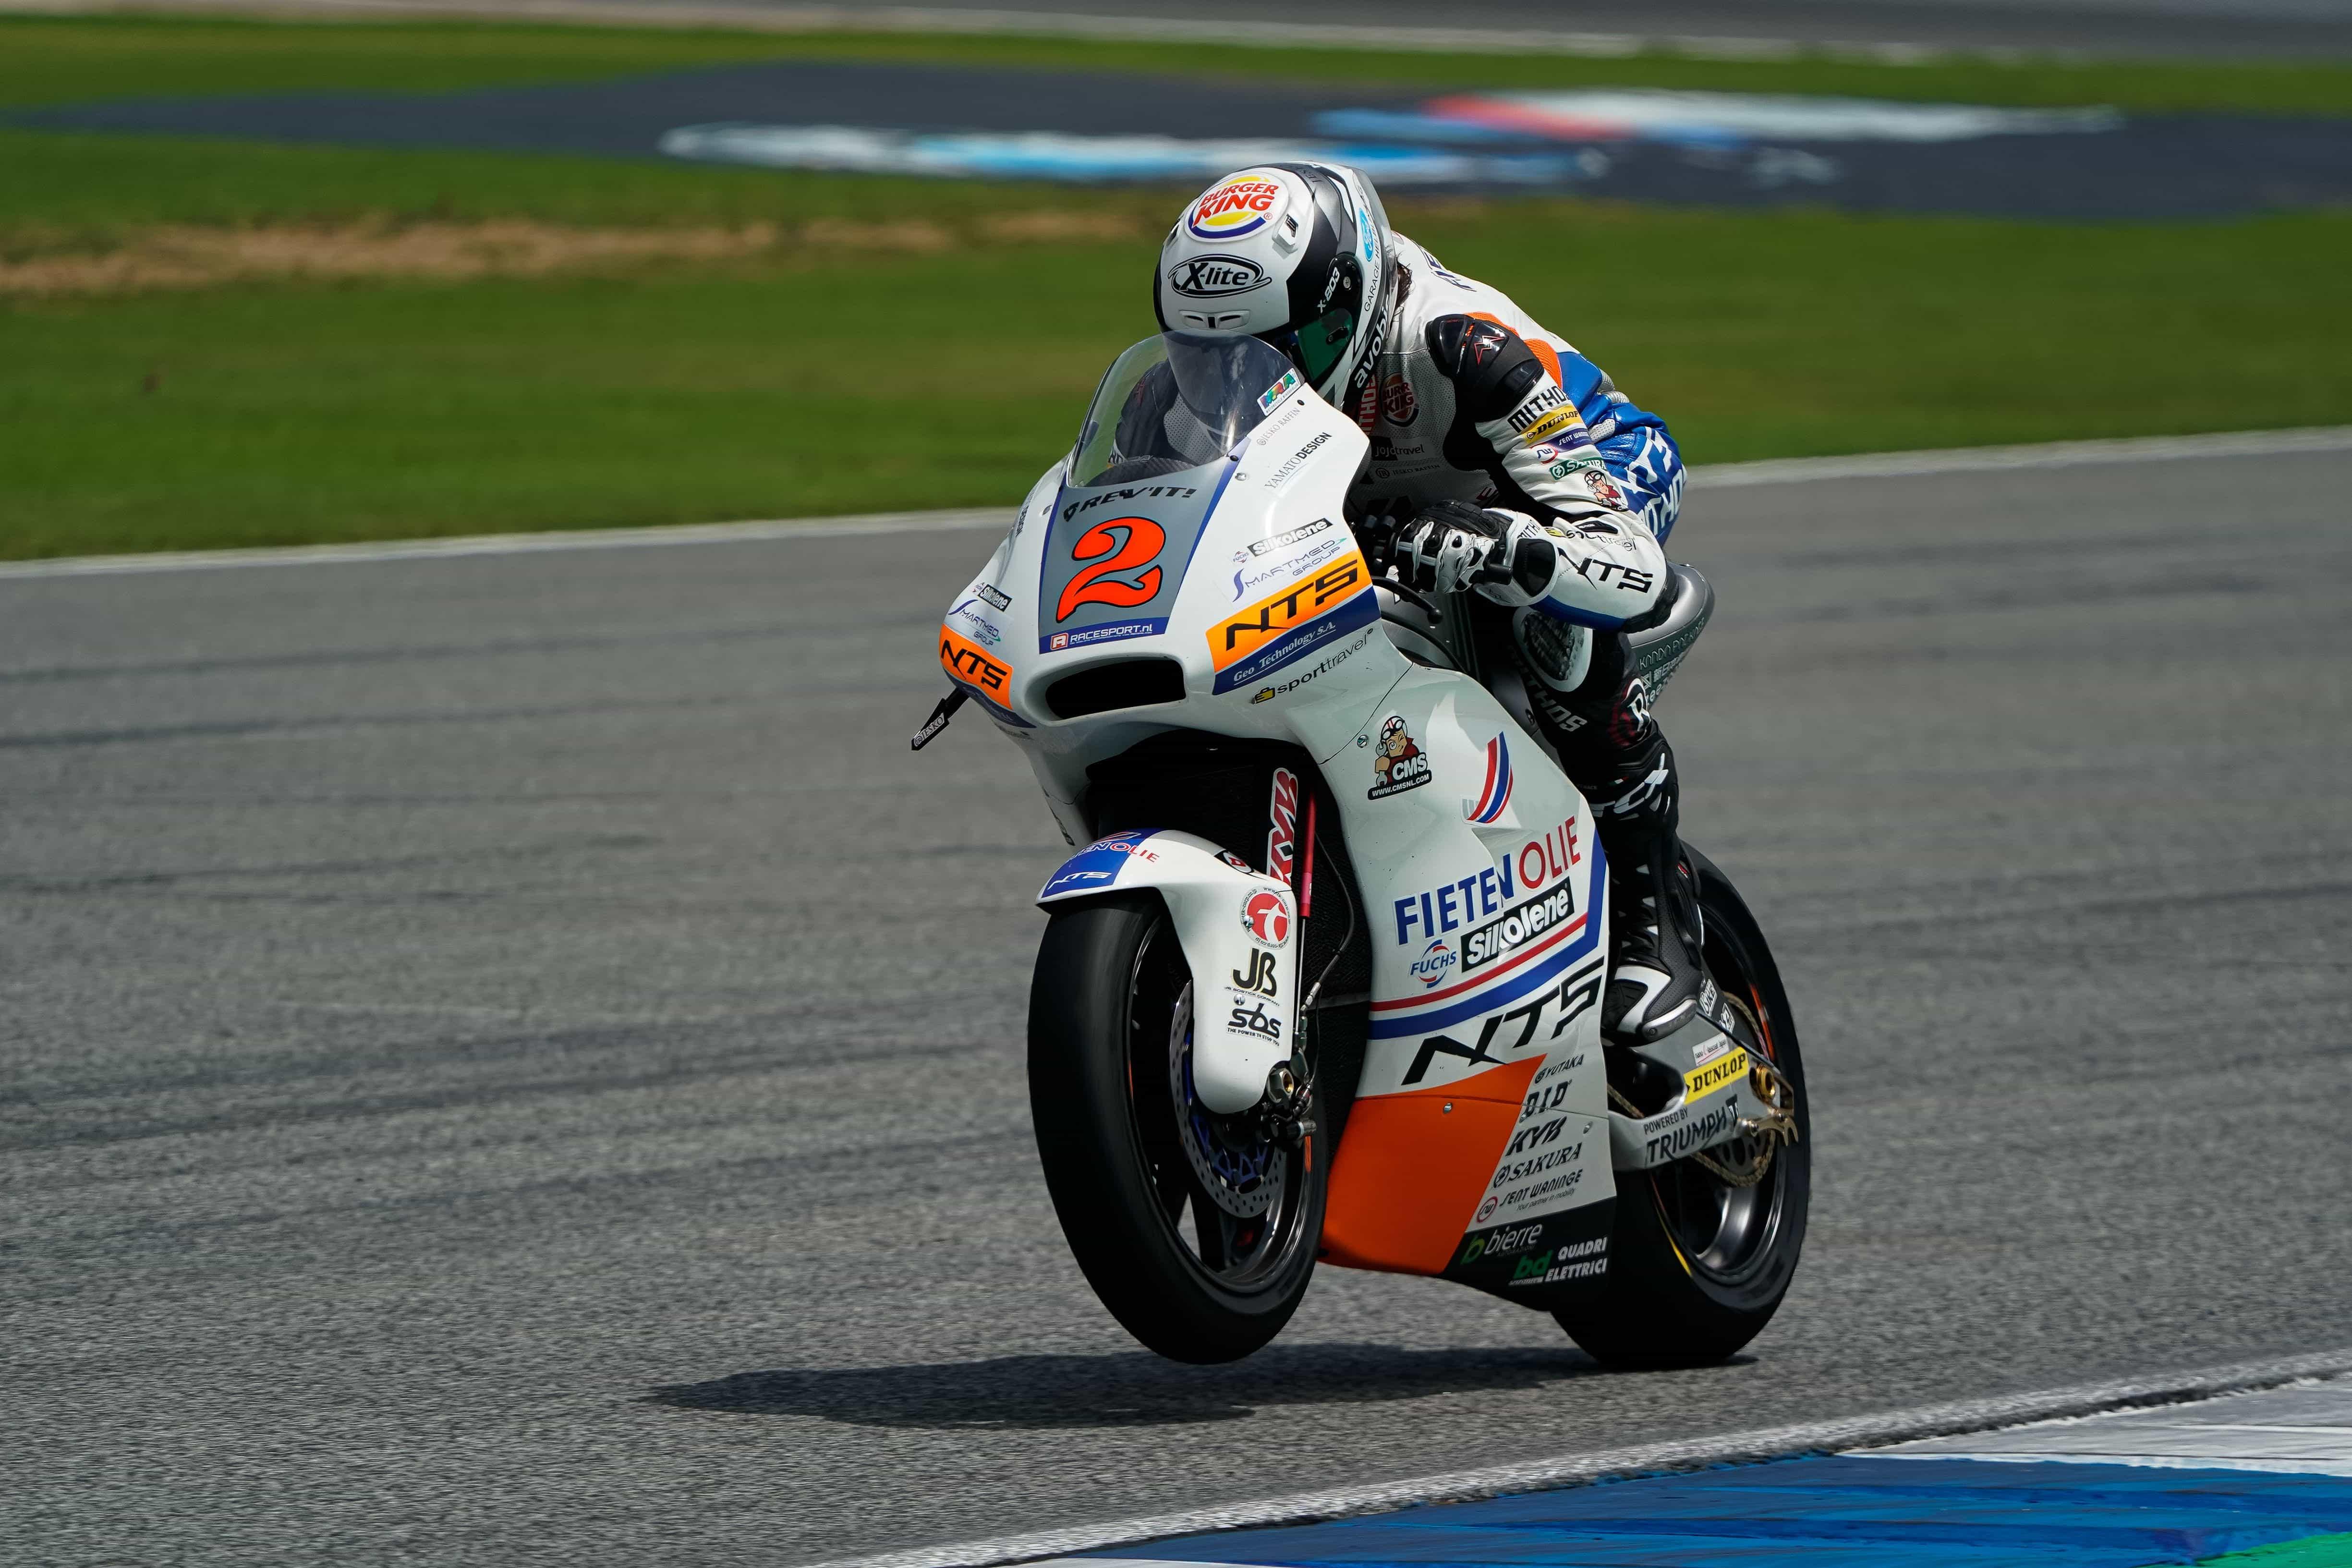 NTS RW Racing GP タイGP 公式練習 3、公式予選レポート